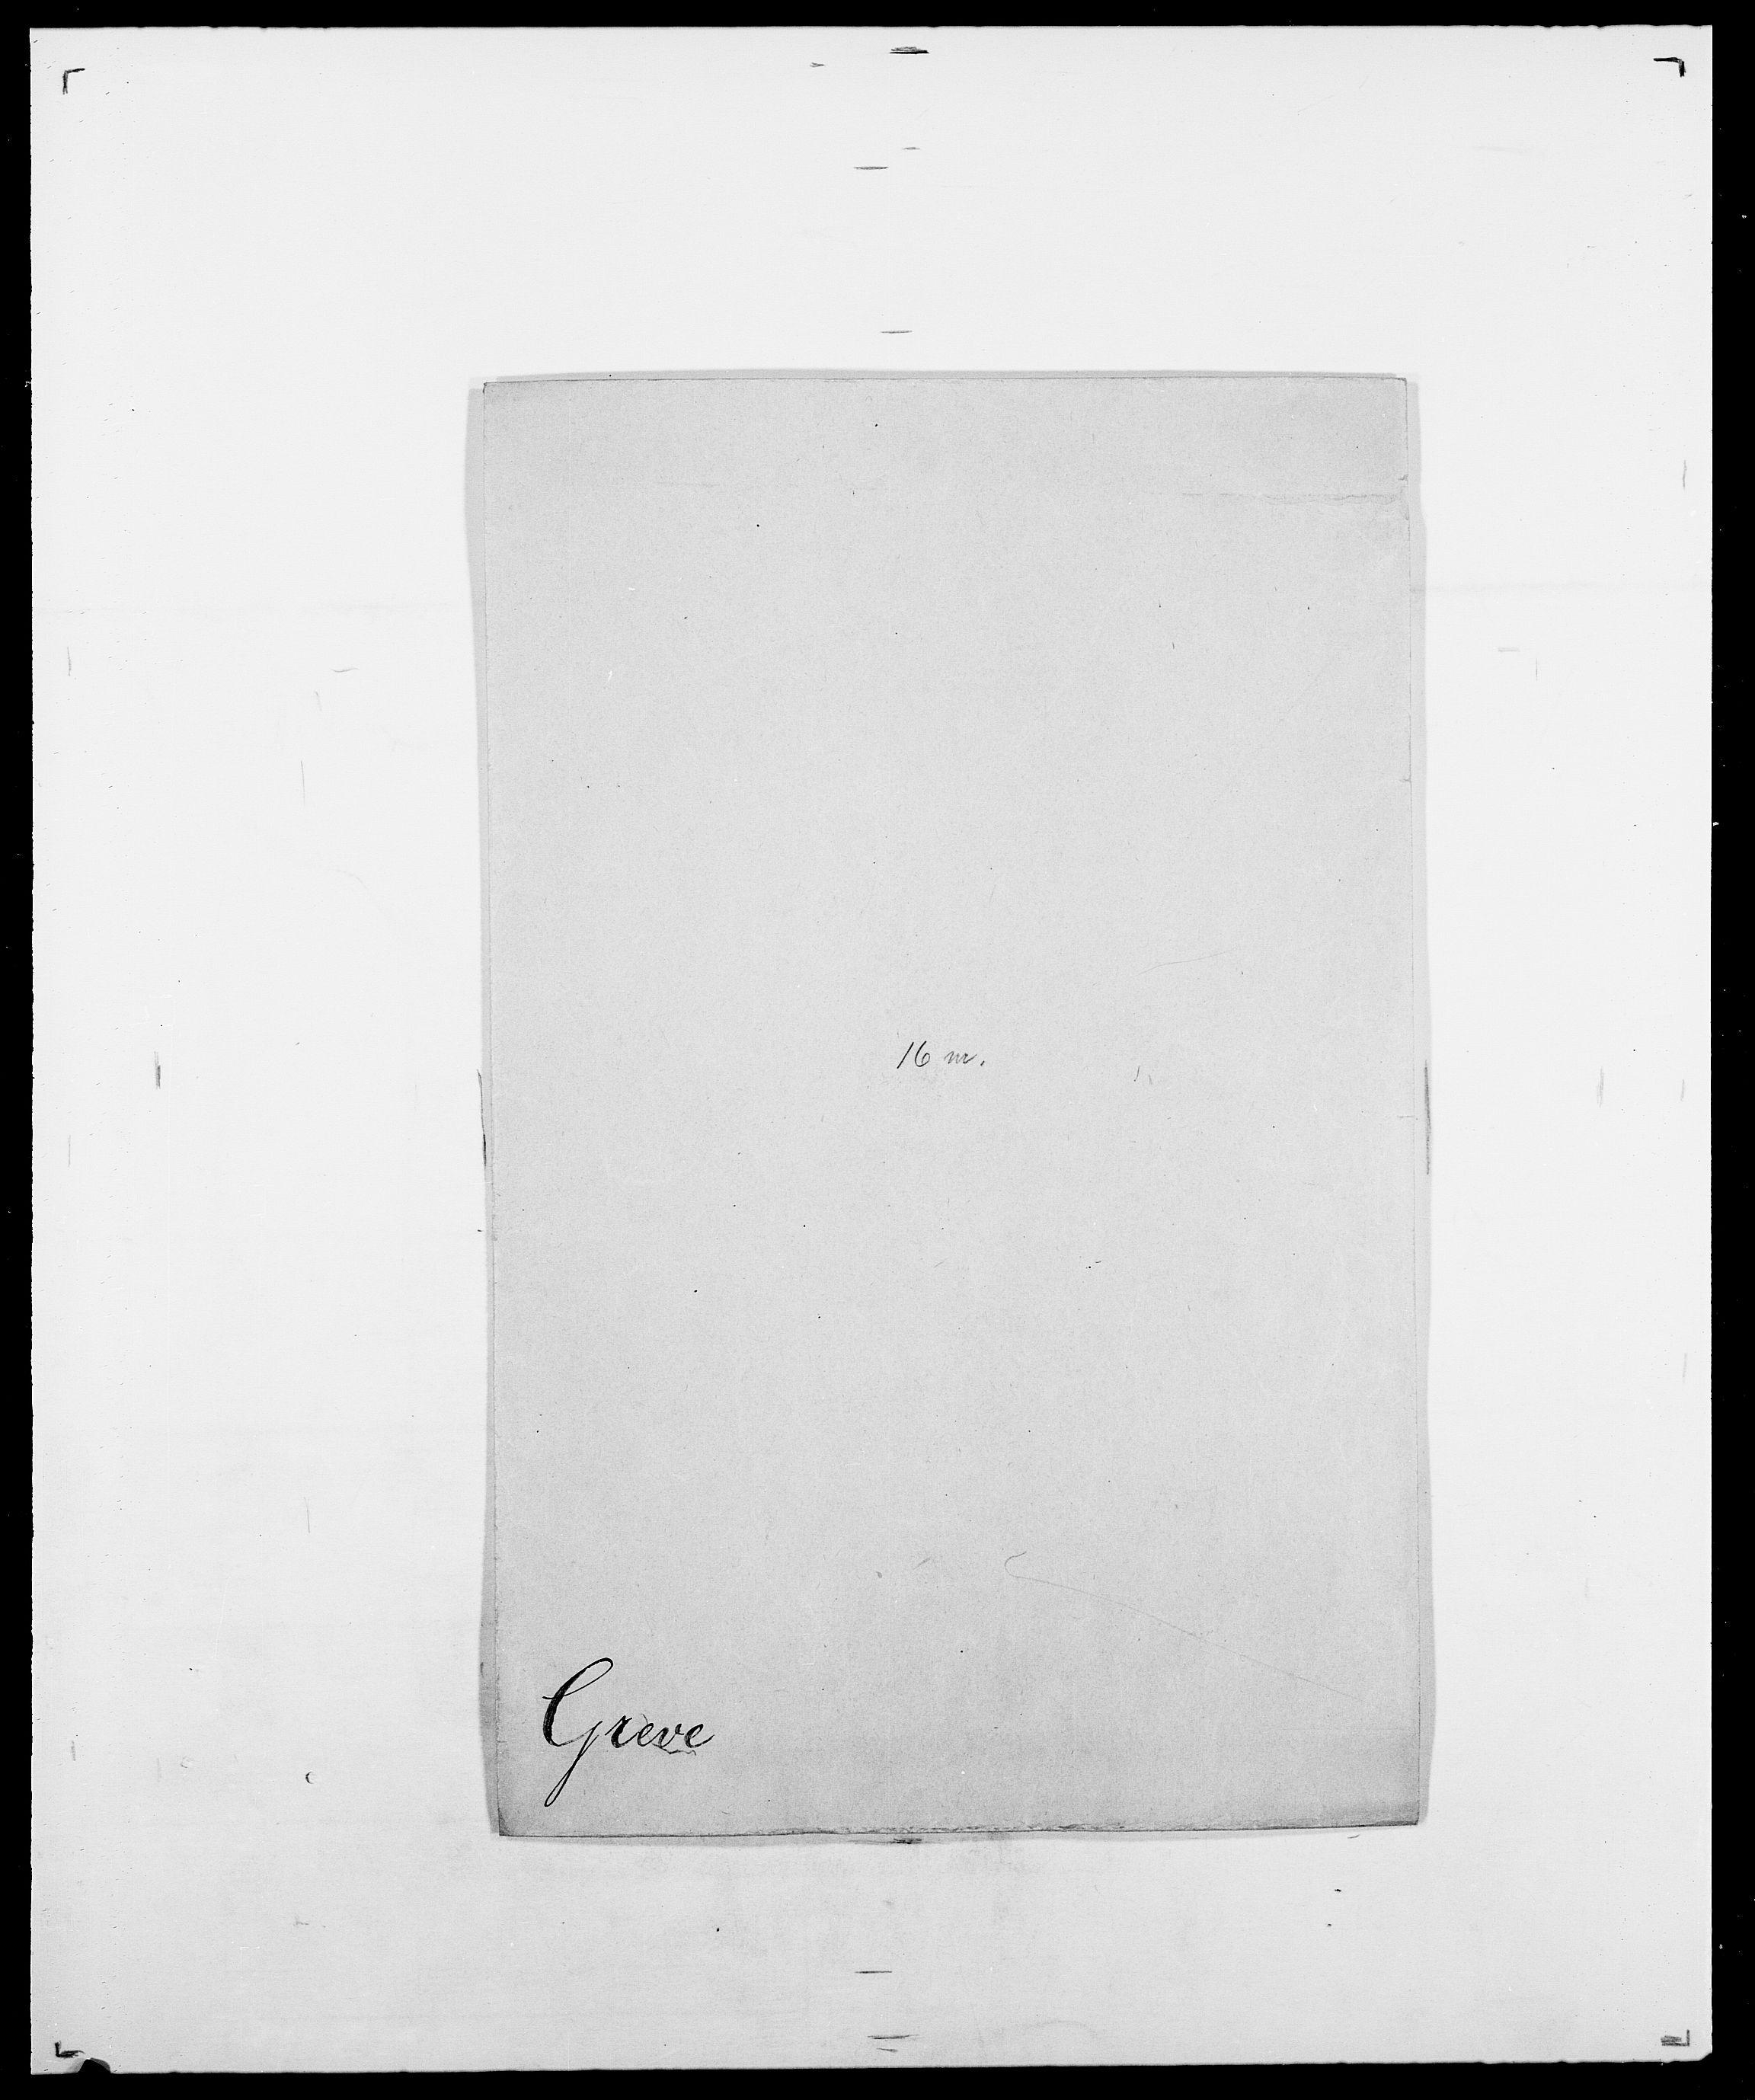 SAO, Delgobe, Charles Antoine - samling, D/Da/L0014: Giebdhausen - Grip, s. 610